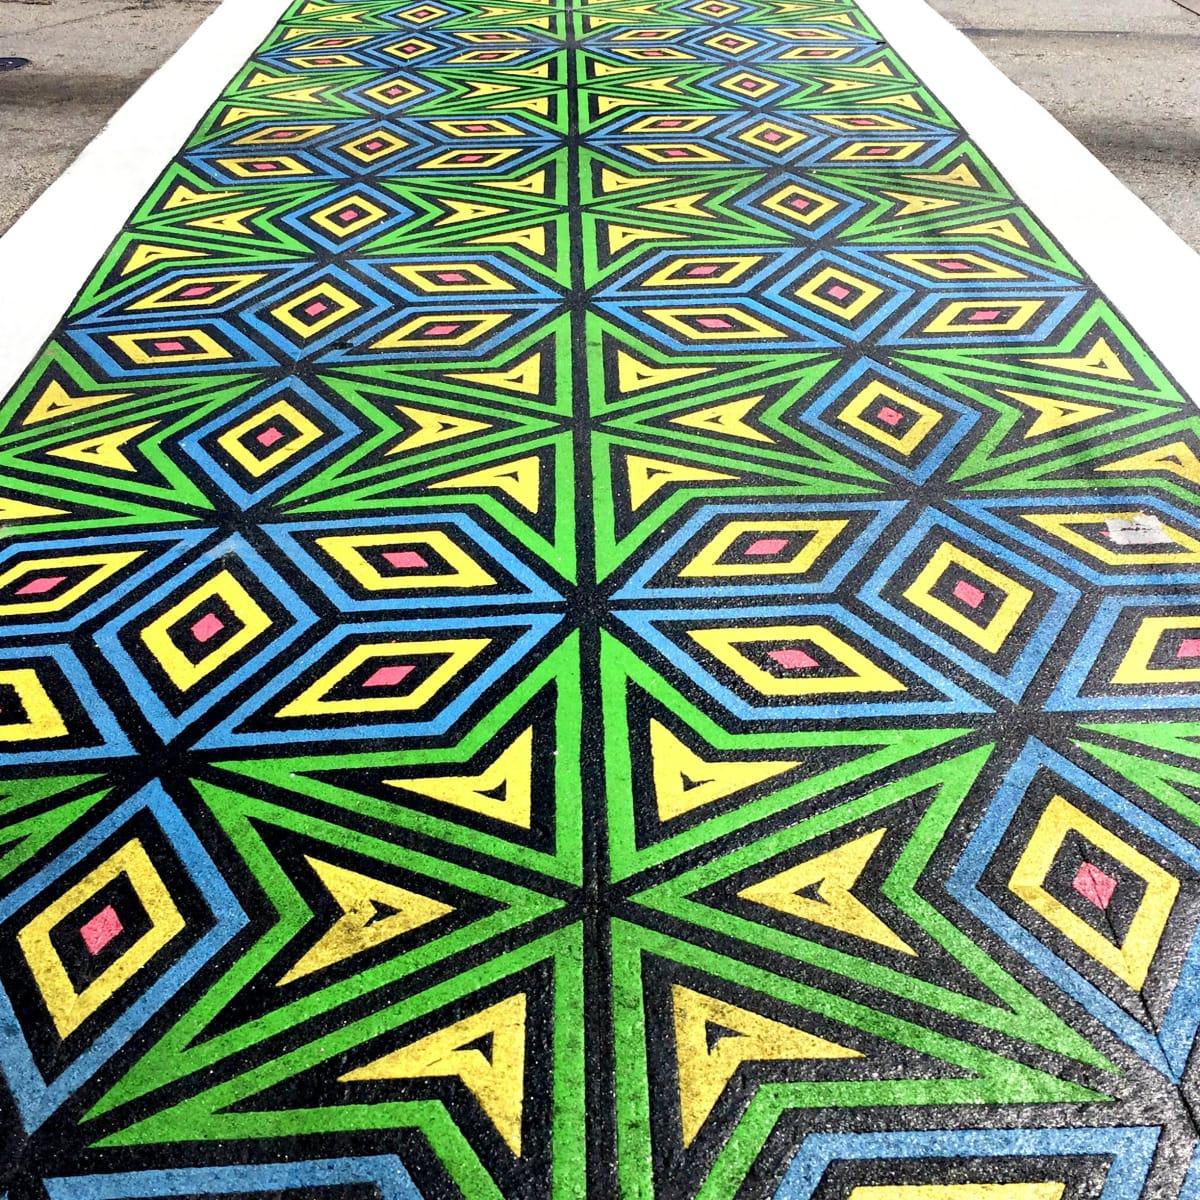 Unicorn Art Theory crosswalk in Uptown Dallas